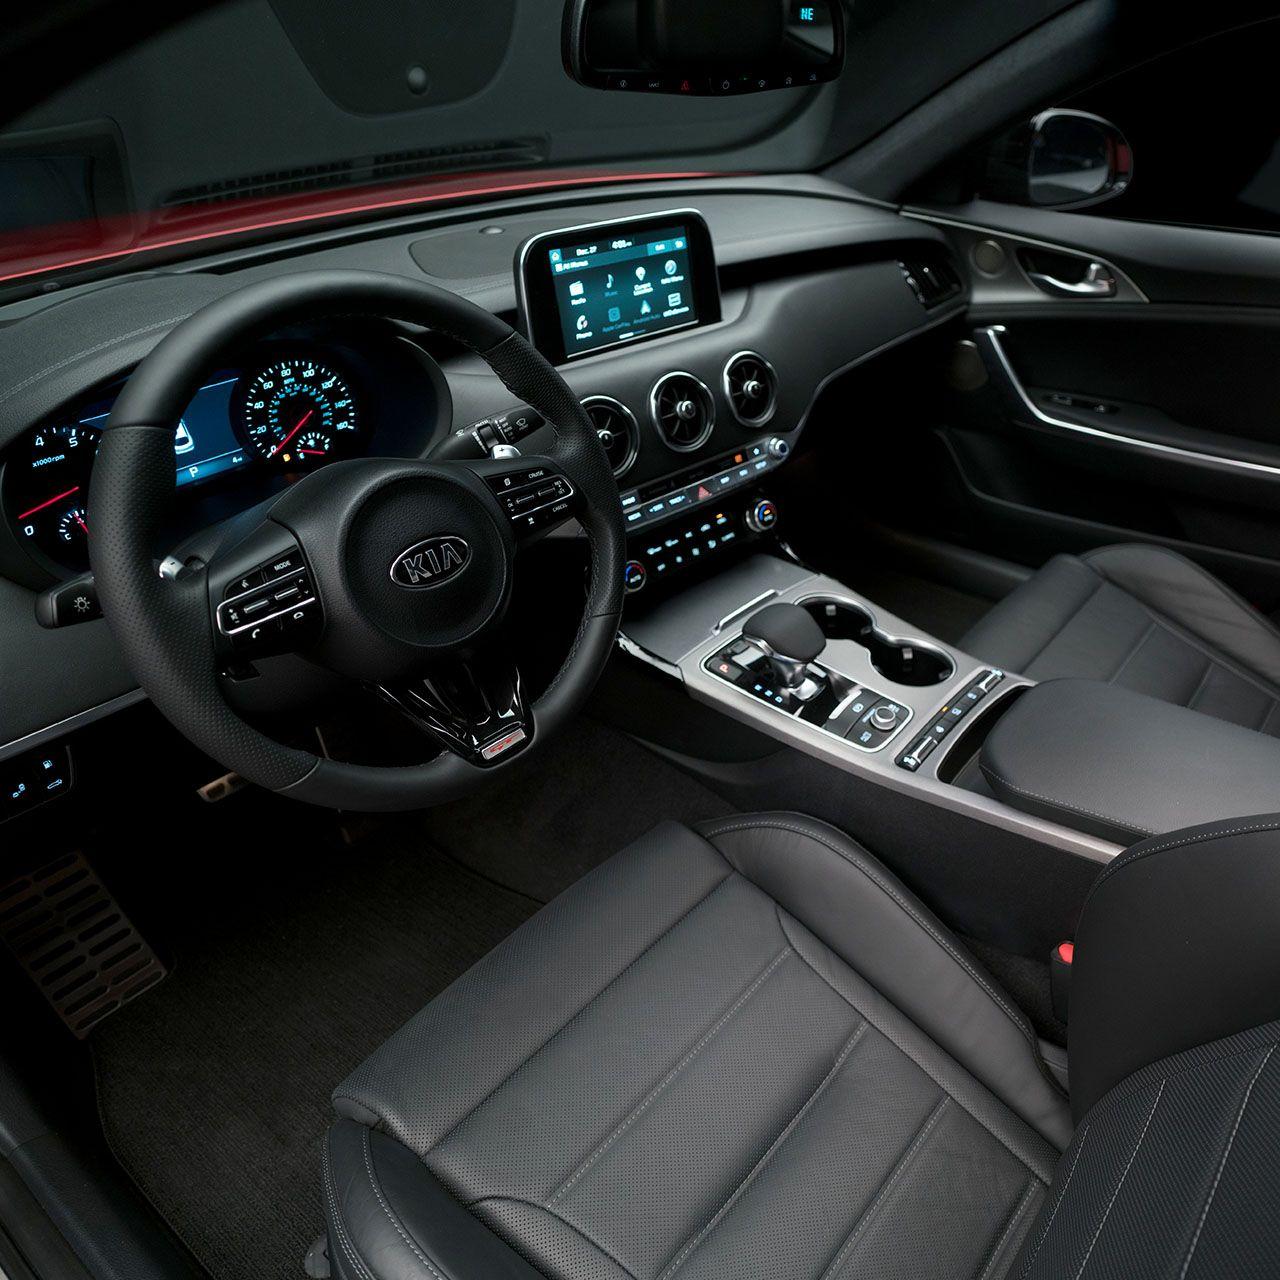 2018 Kia Singer Kiaoflincoln Kia Kiastinger Newcar Lincolnne Kia Stinger Kia Dream Cars Jeep